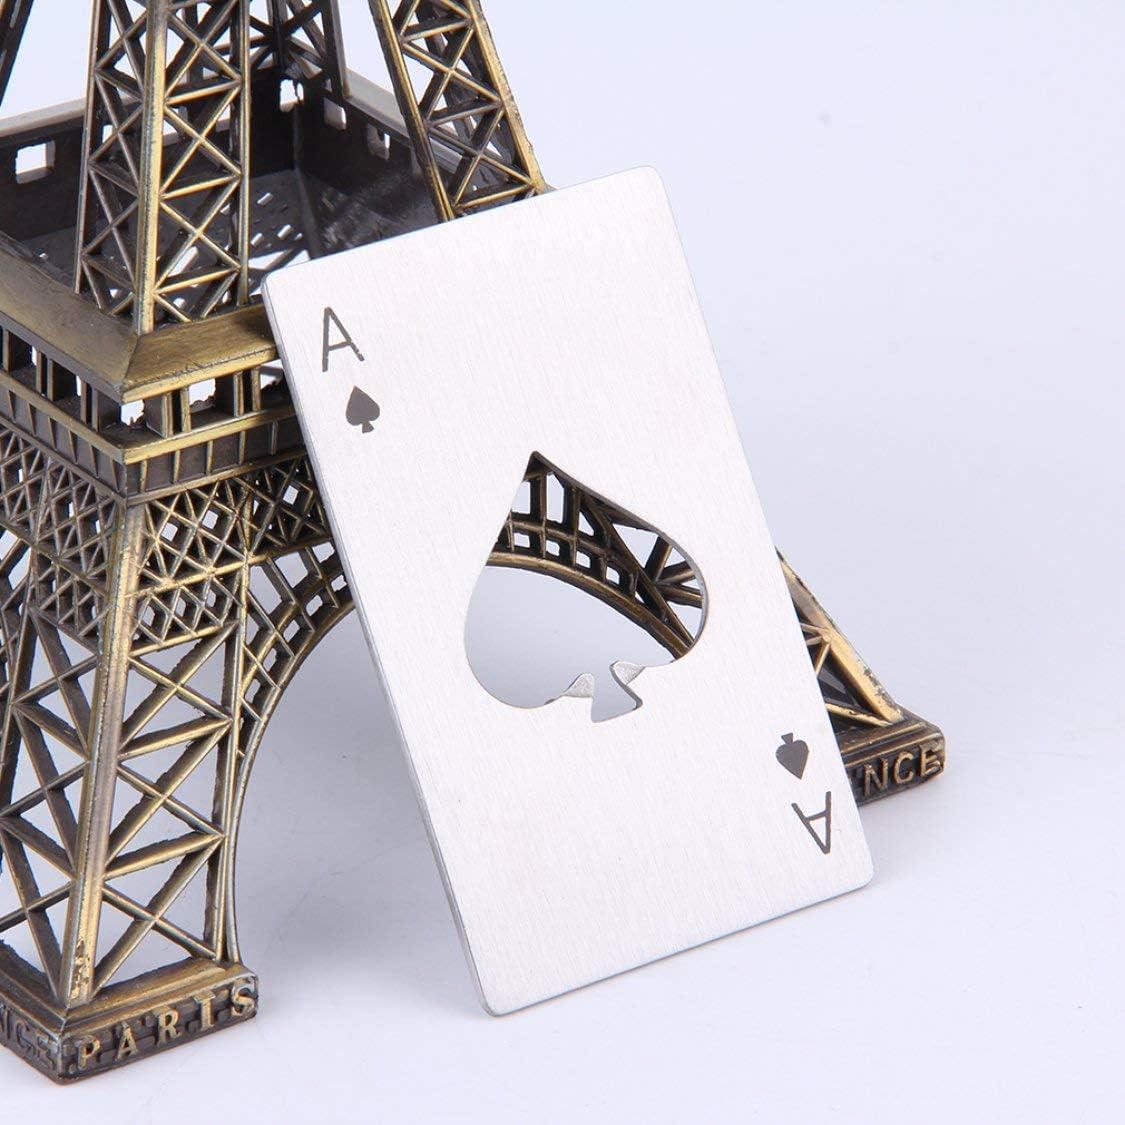 Vige Elegante Poker Carte da Gioco Ace of Spades Bar Strumento Soda Beer Bottle cap Opener Regalo per la Cucina Campeggio allaperto